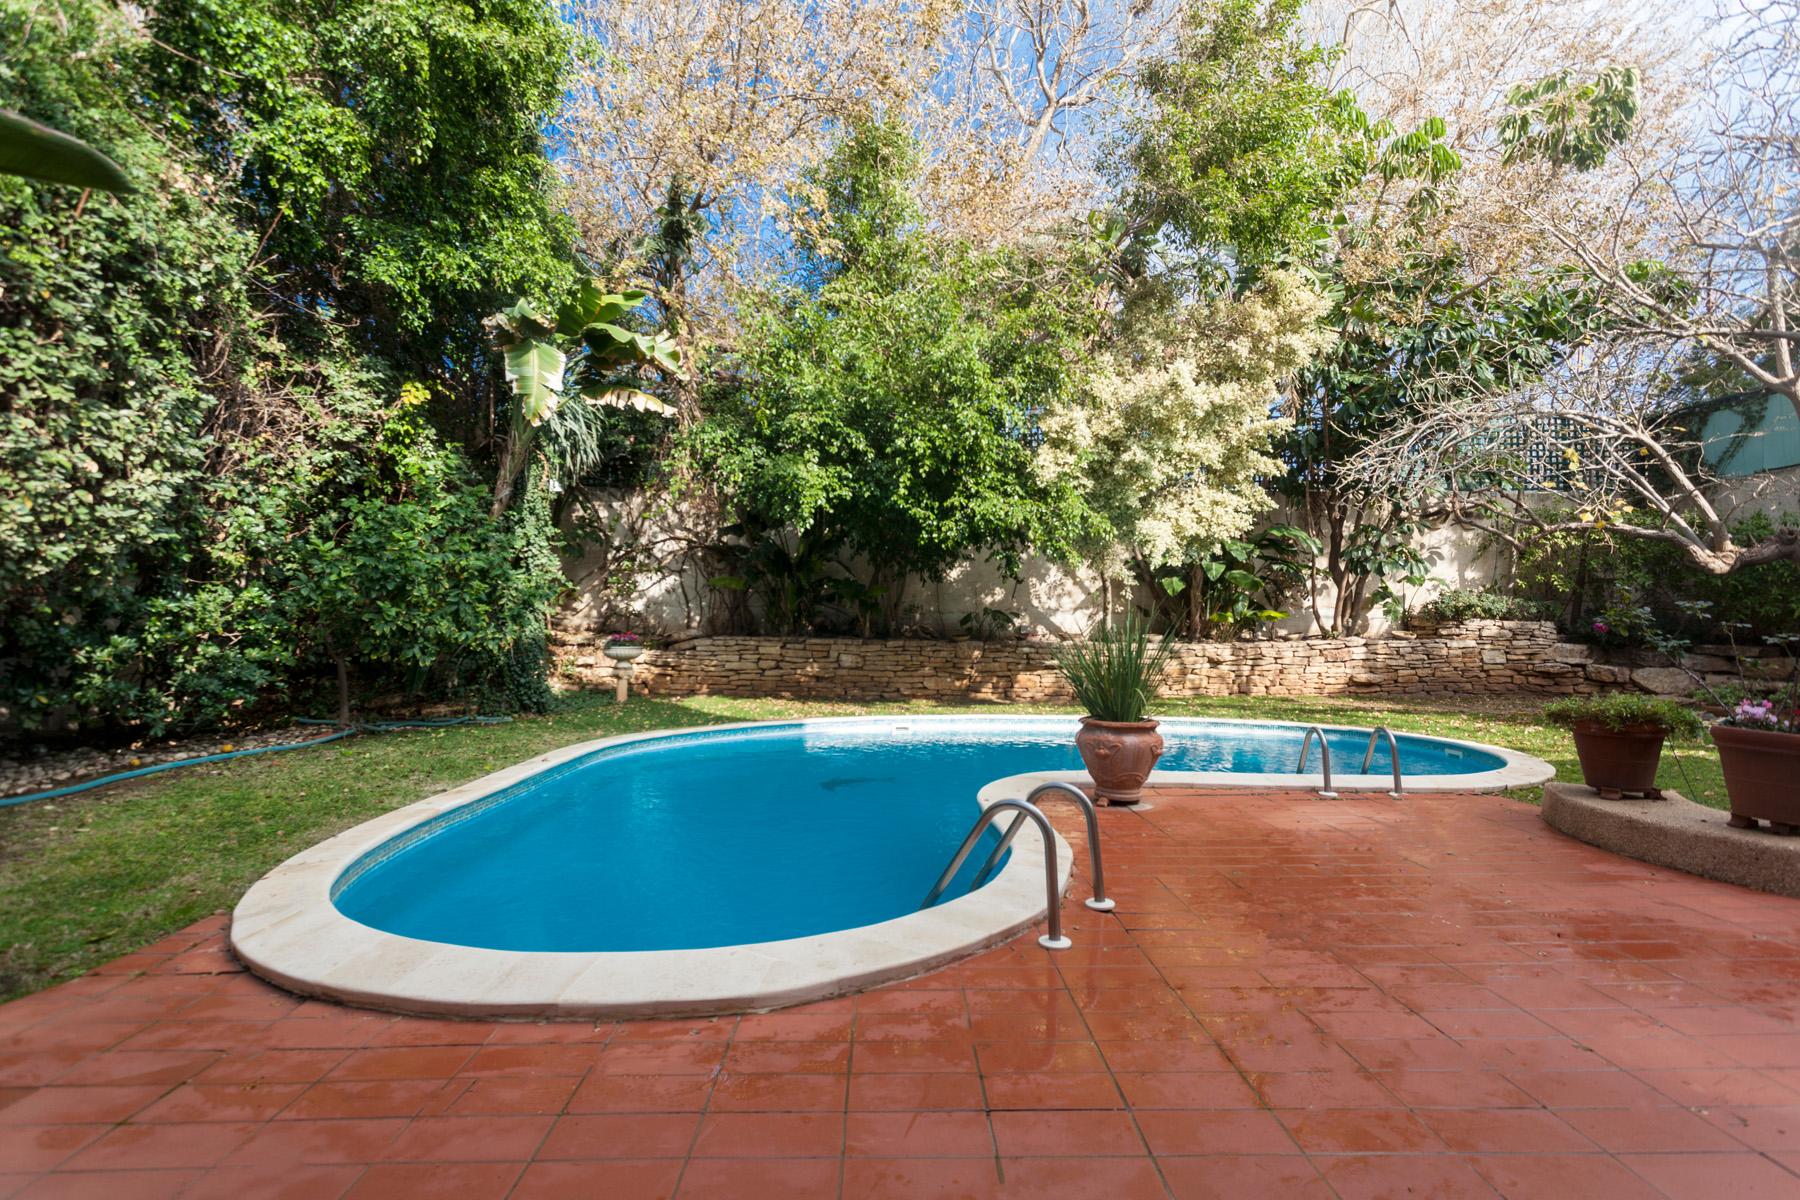 Single Family Home for Sale at Inviting Classical Villa near the Sea Herzliya, Israel Israel